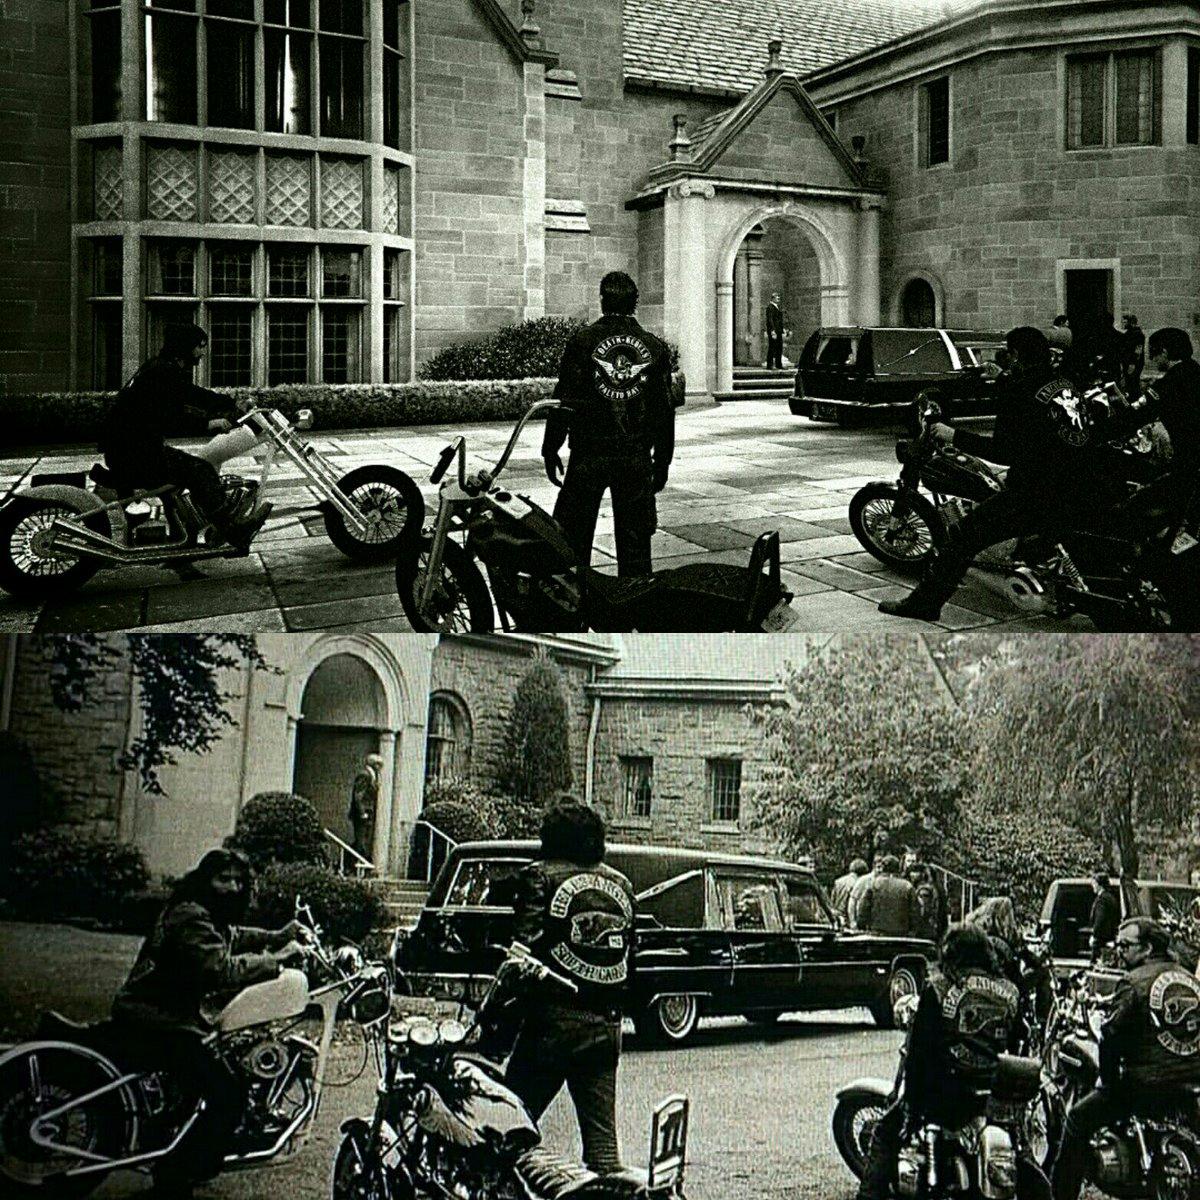 The Funeral recreation with Death Rebels MC and @InfernalPunksMC  https://www. instagram.com/p/BU9HcN-FAX0/ ?taken-by=archangels_mc &nbsp; …  #archangels_mc #Recreation #Snapmatic #GTAOnline<br>http://pic.twitter.com/S6UrOotEps